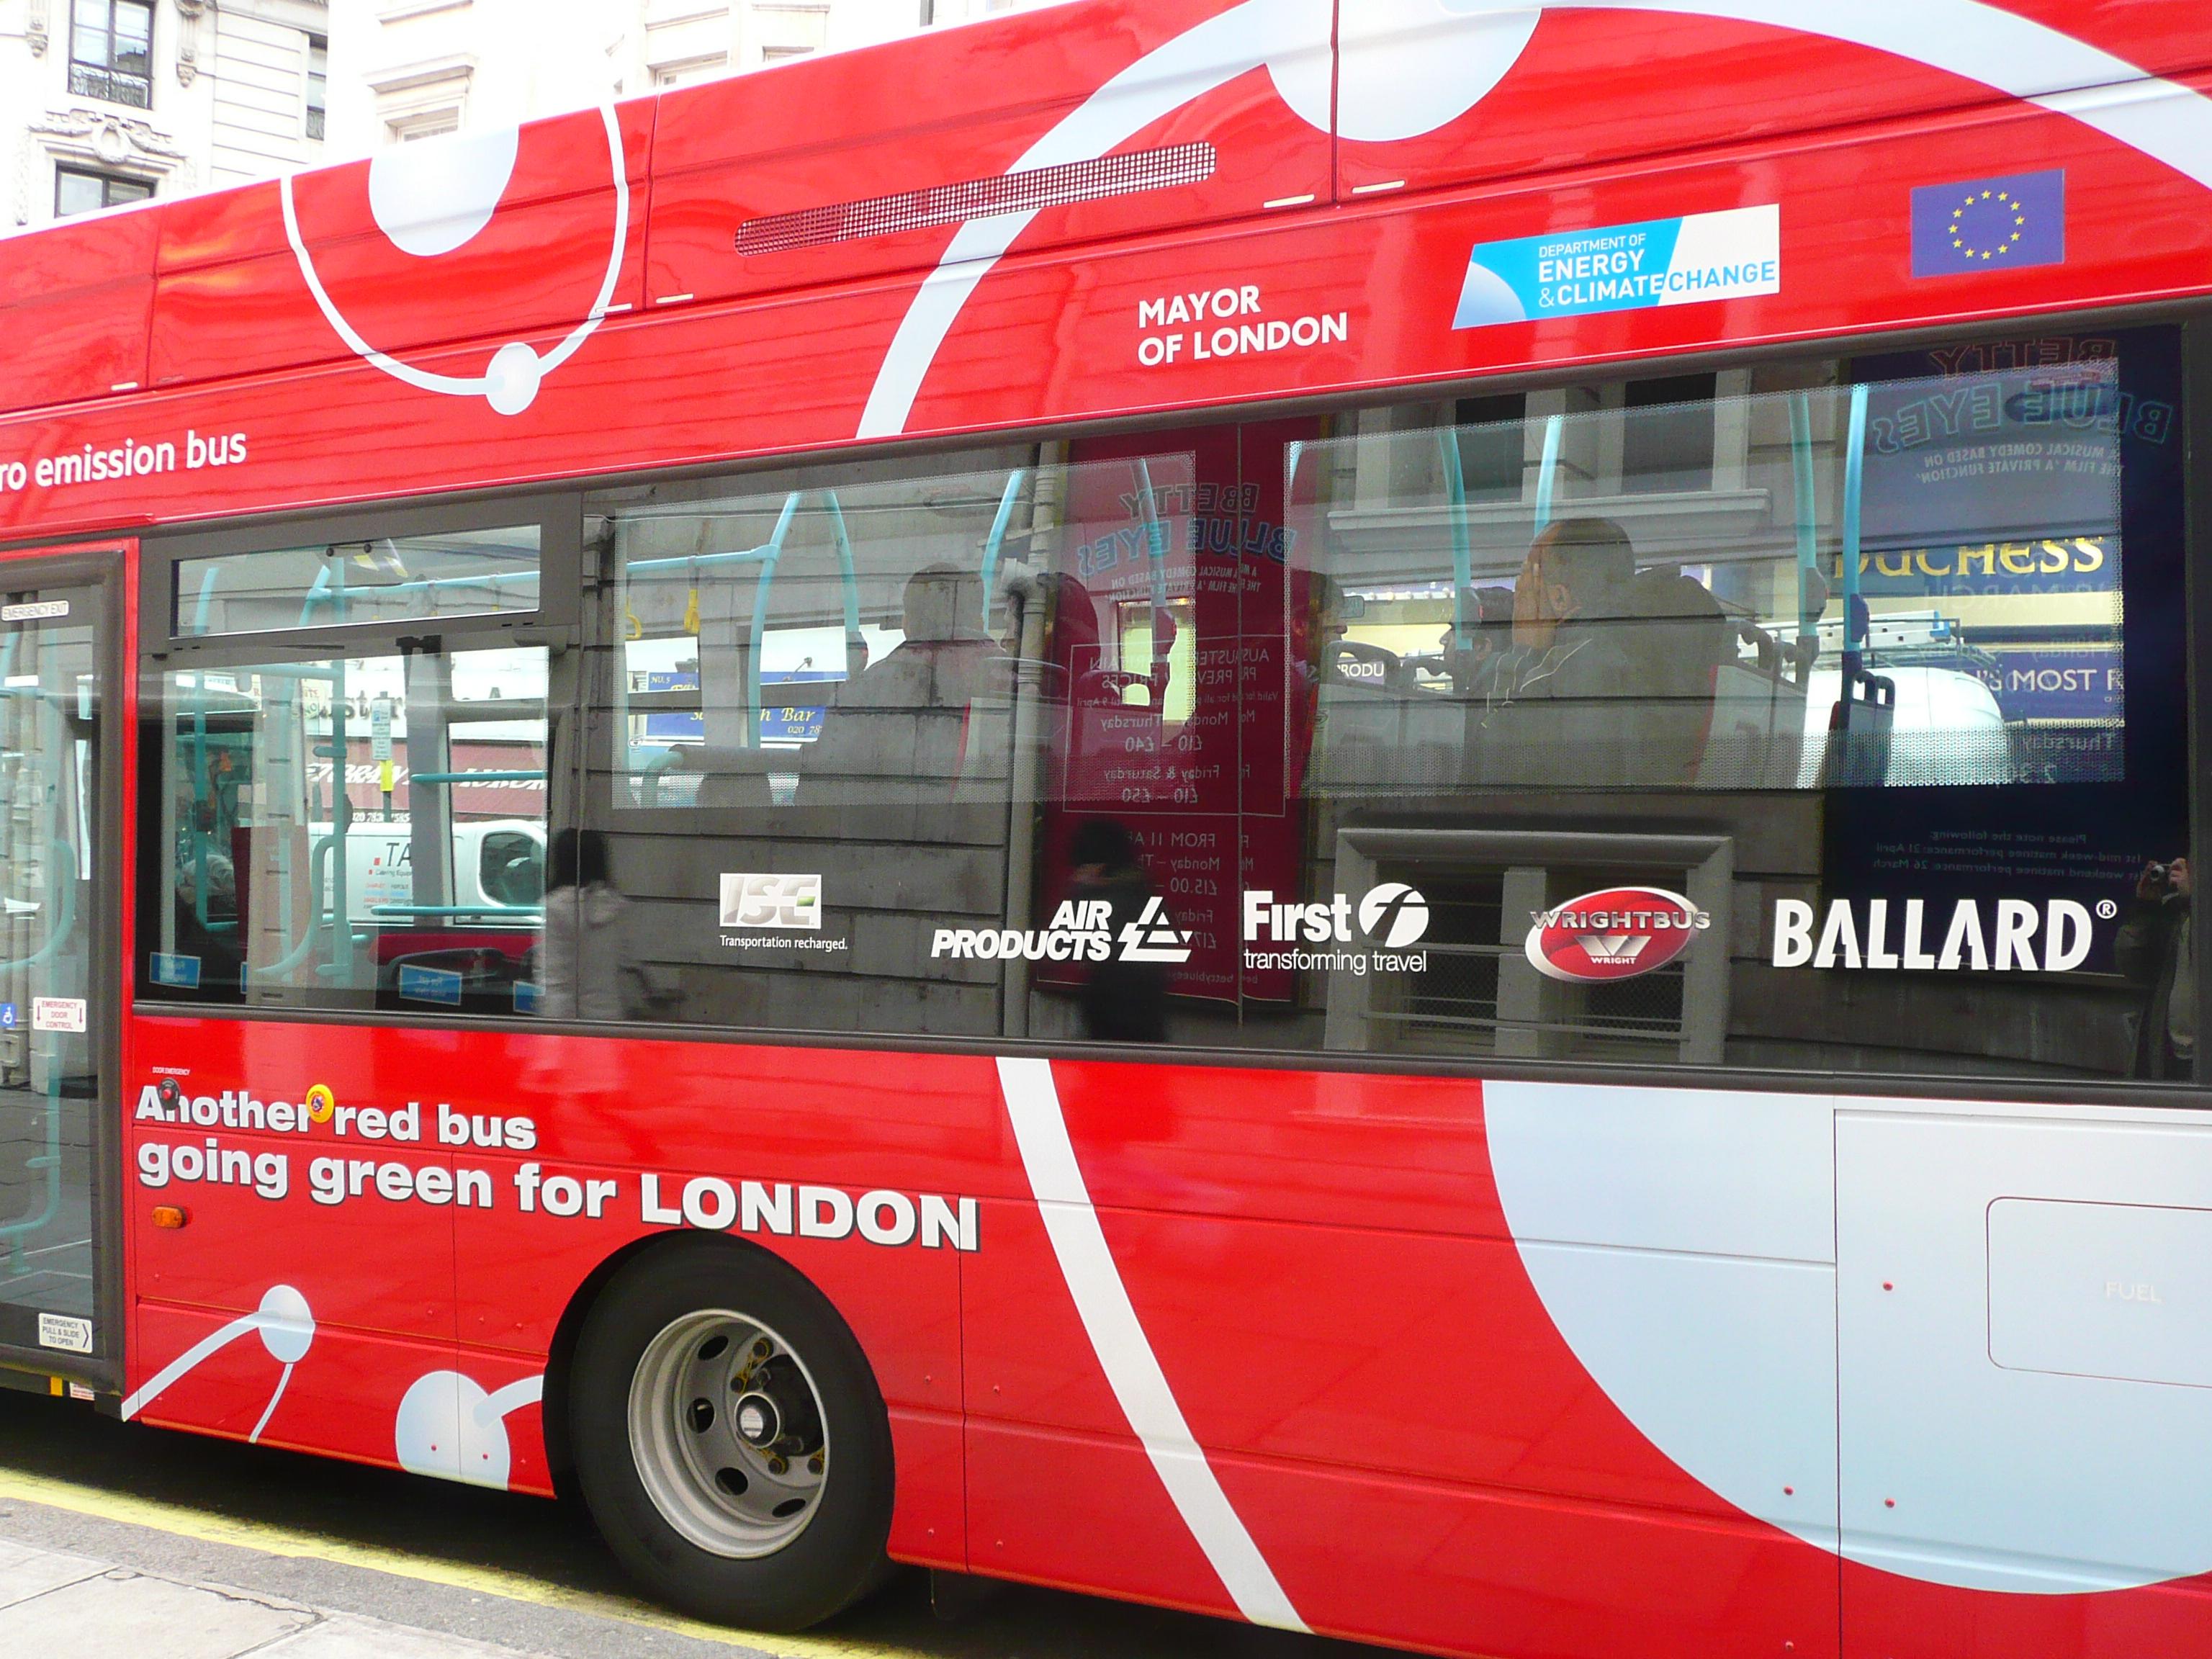 Ballard-fuel-cell-bus-London.jpg